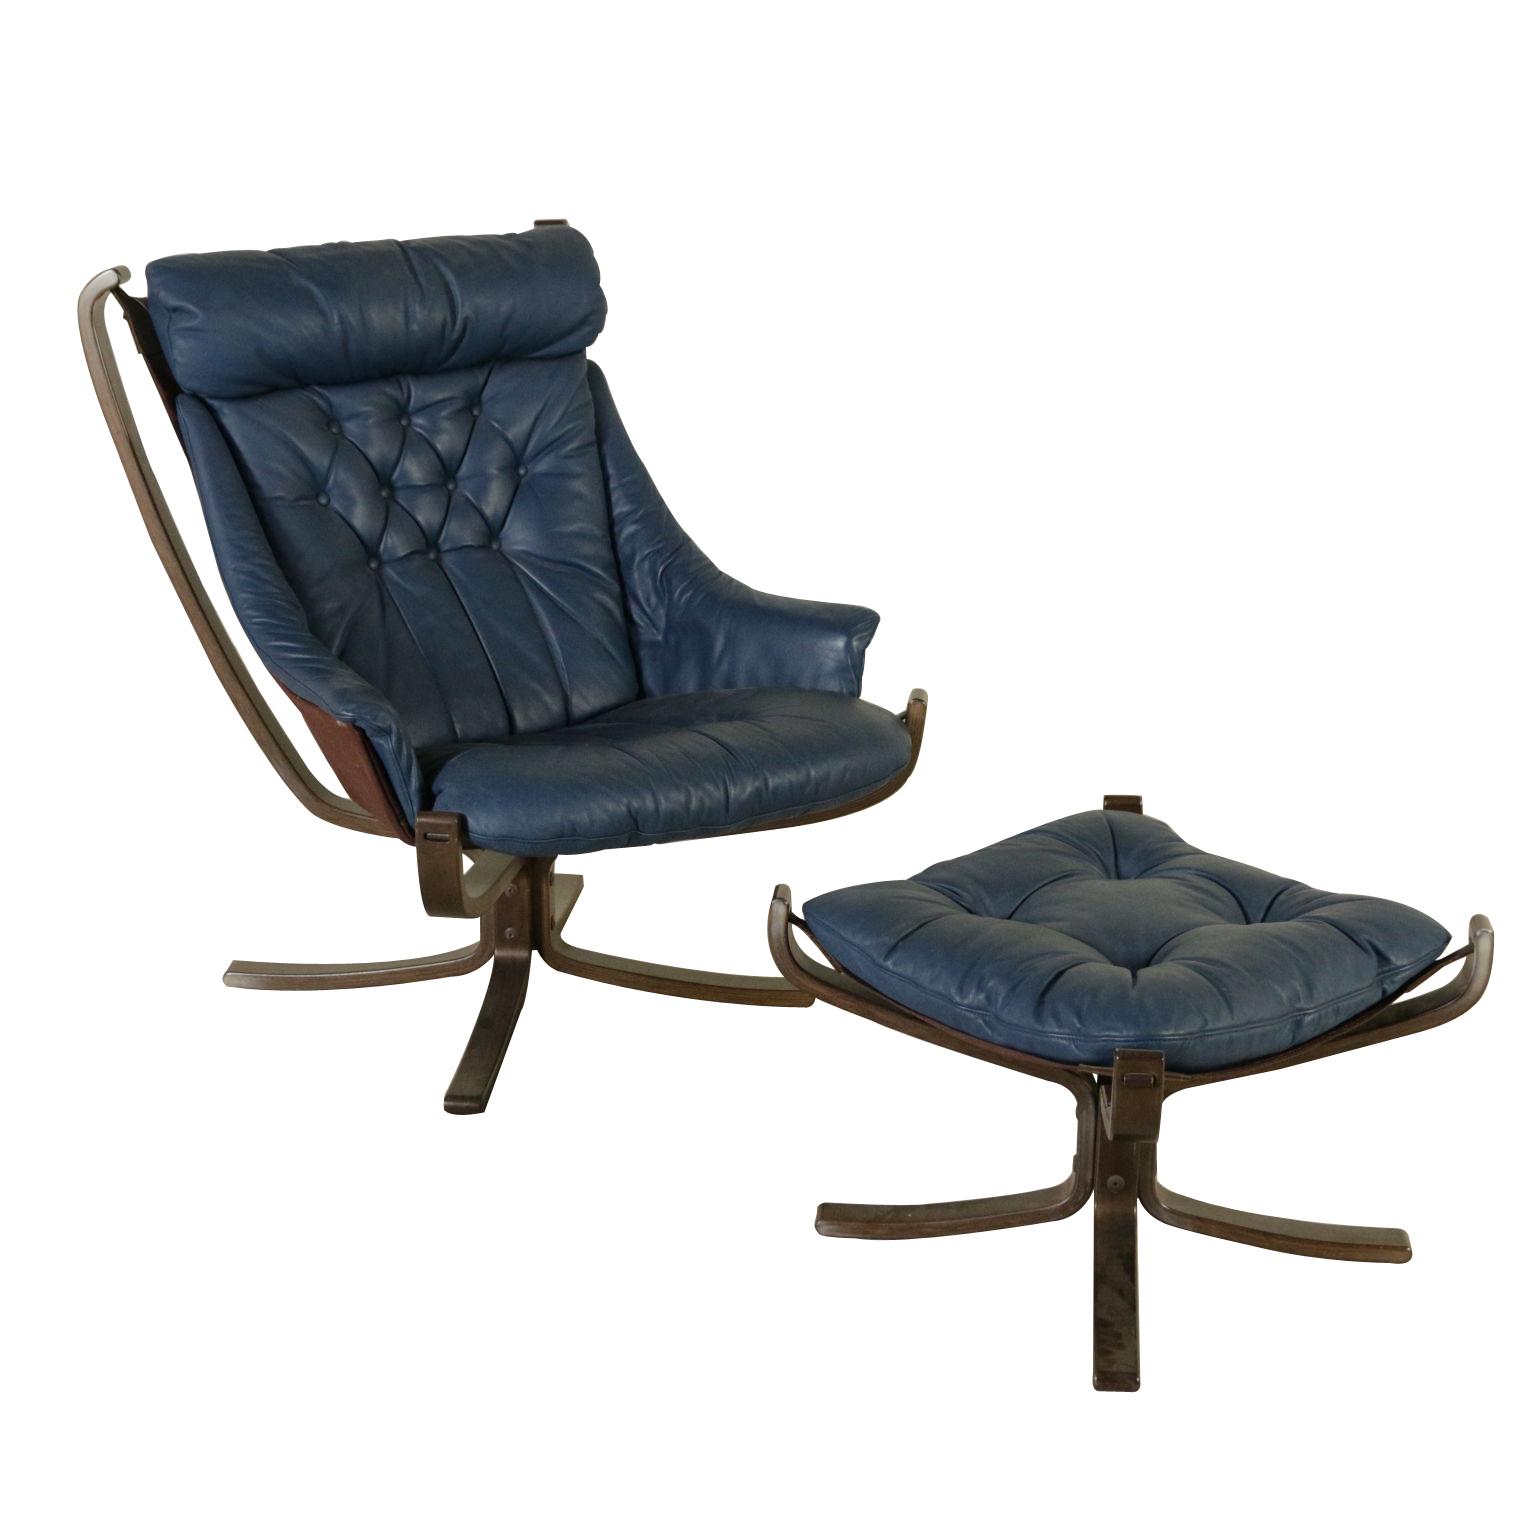 poltrona frau poltrone modernariato. Black Bedroom Furniture Sets. Home Design Ideas